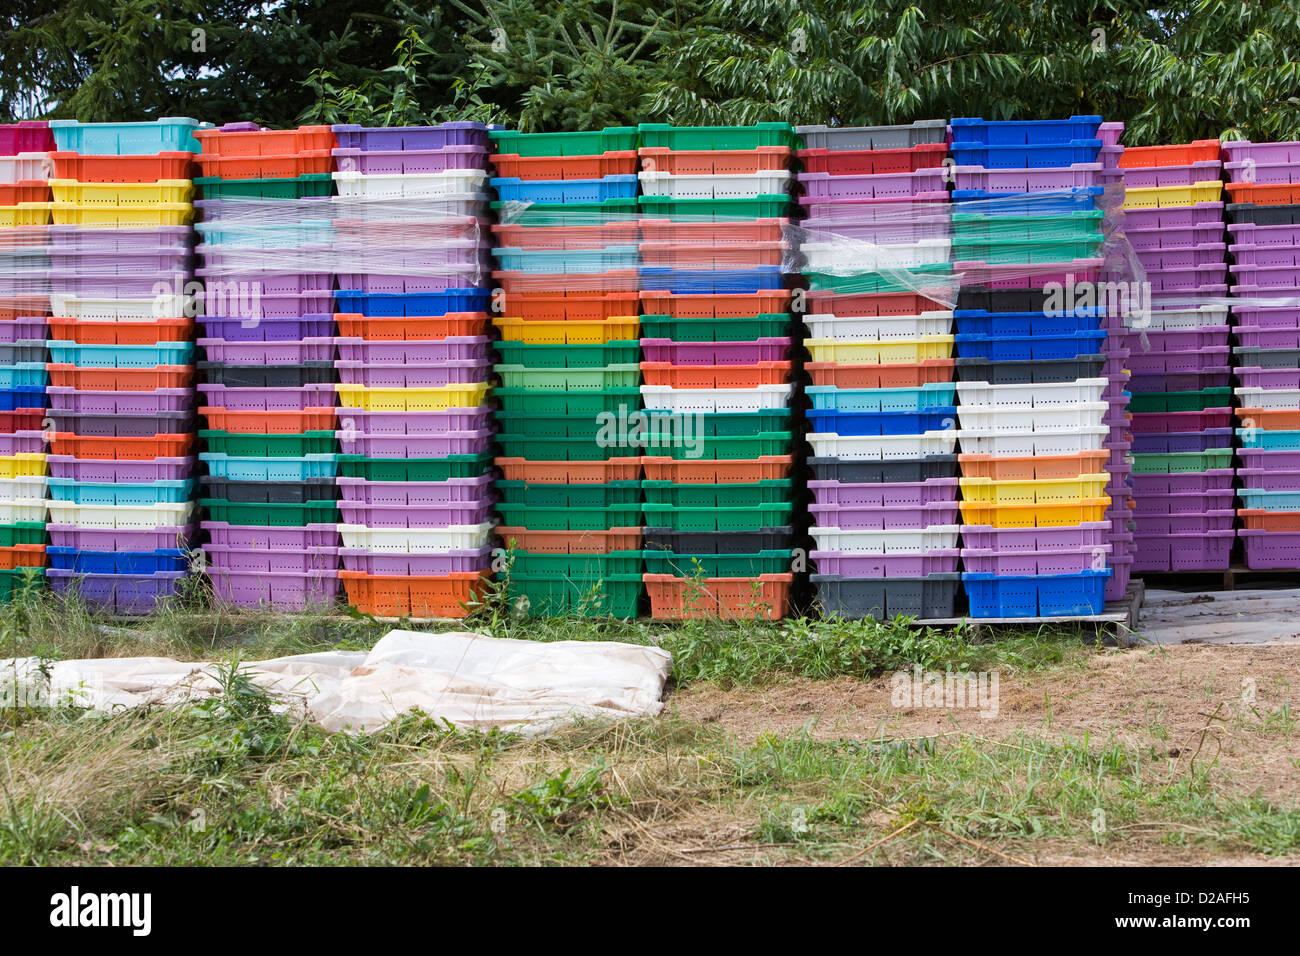 Stacks of plastic fish crates, Nova Scotia, Canada - Stock Image